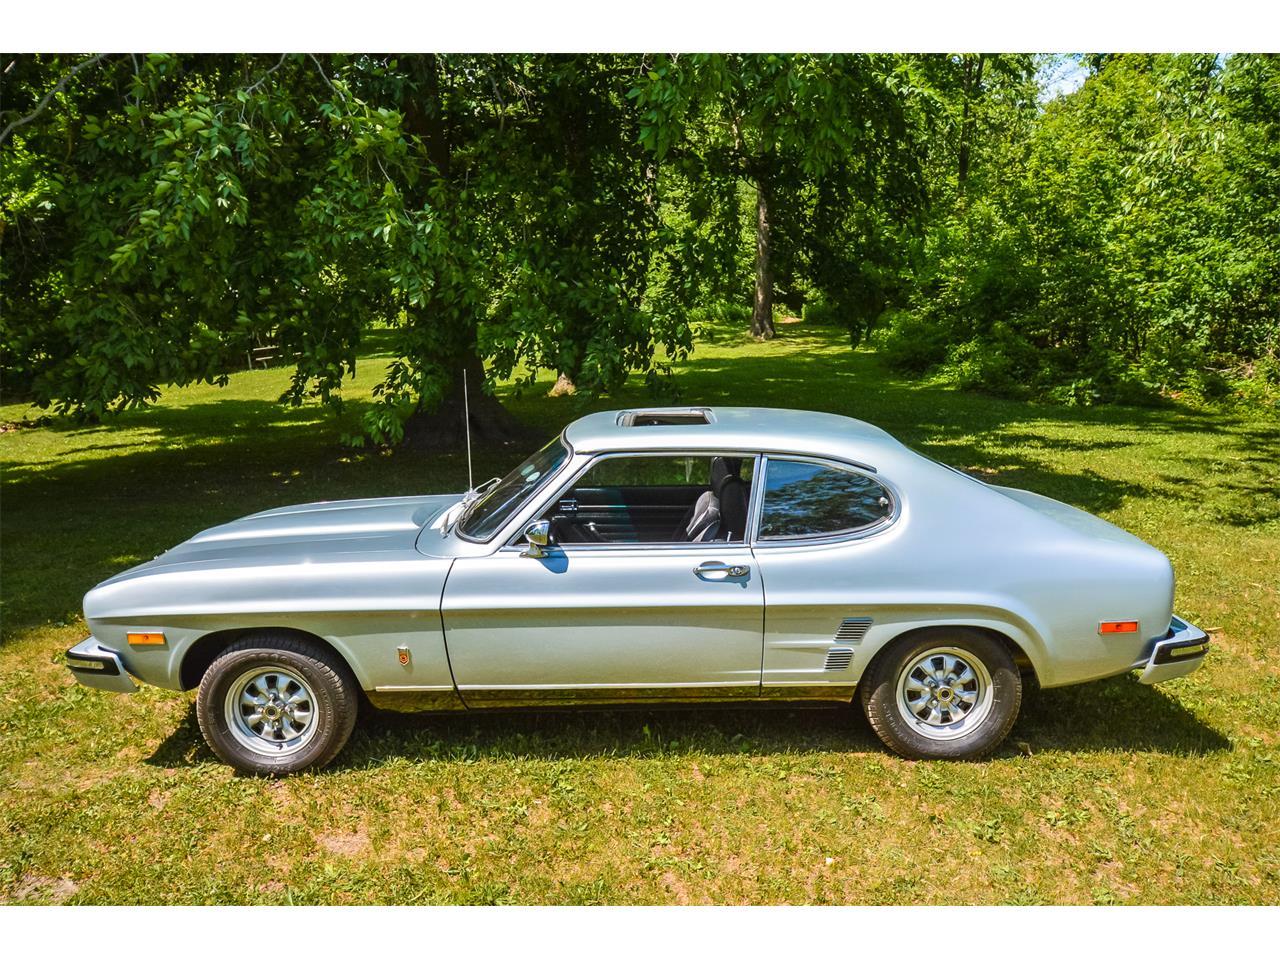 1974 Mercury Capri For Sale Classiccars Com Cc 1007706